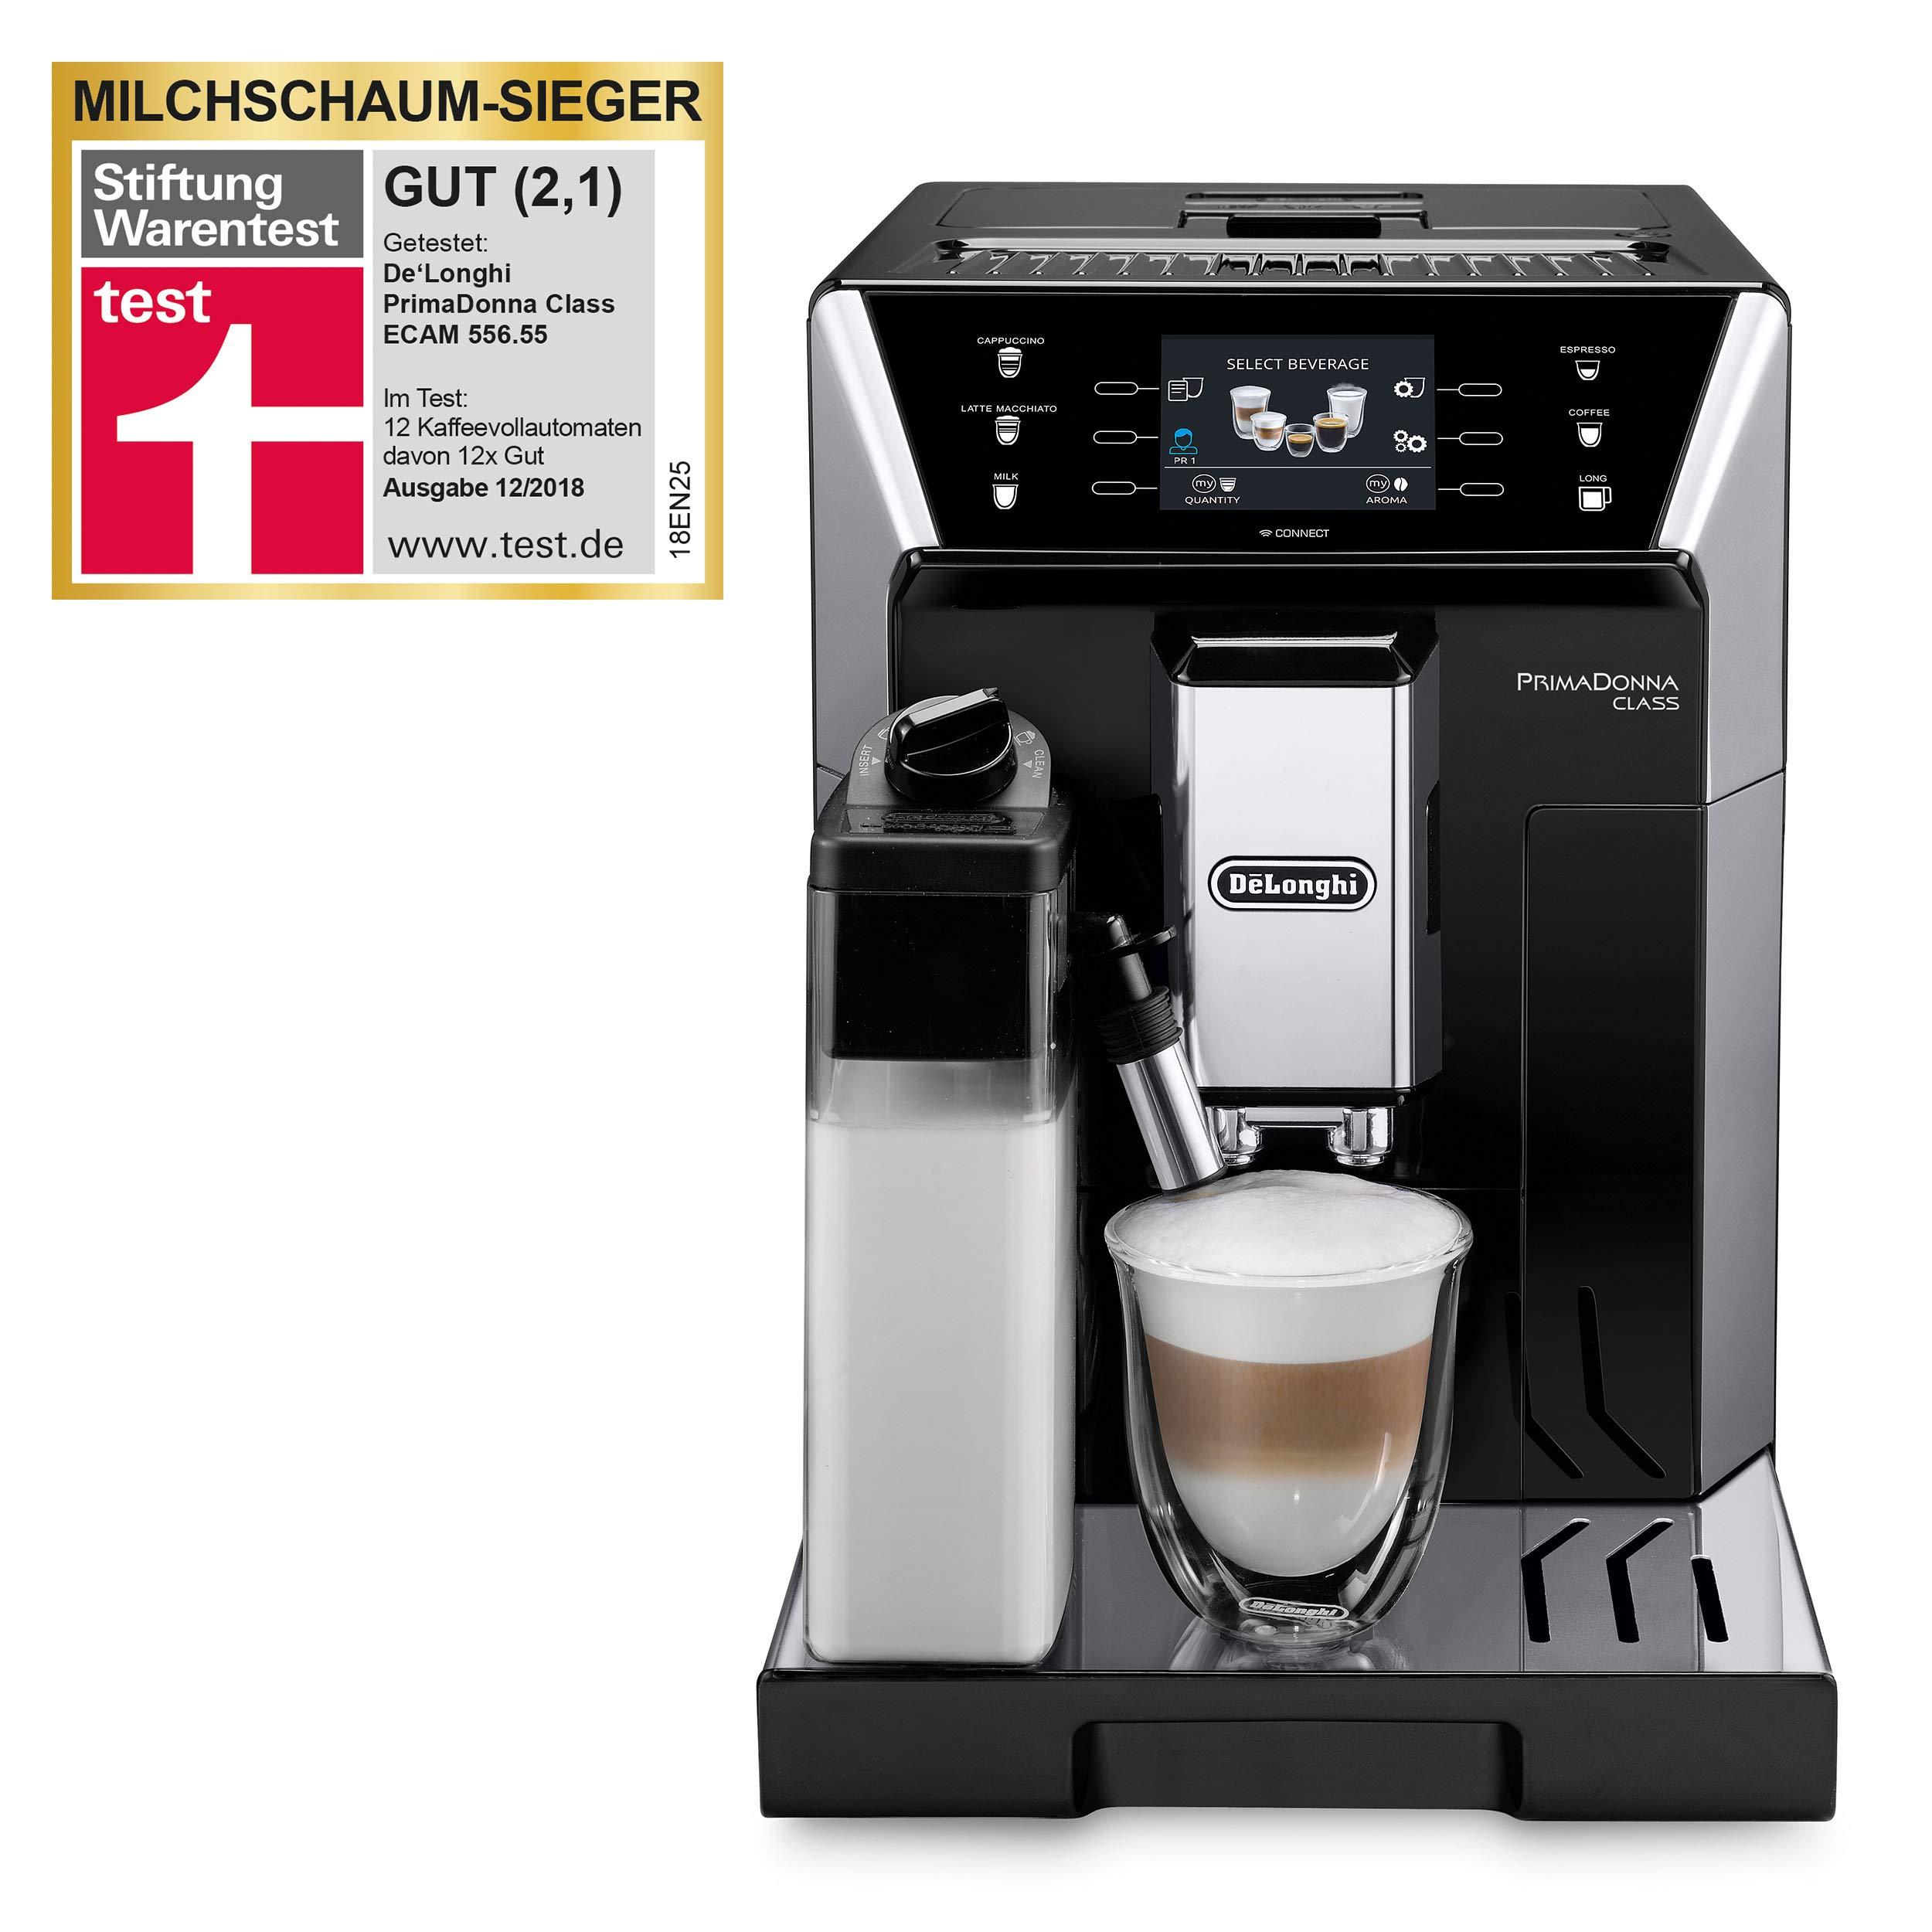 De'Longhi ECAM 556.55.SB PrimaDonna Class Kaffeevollautomat (App-Steuerung)